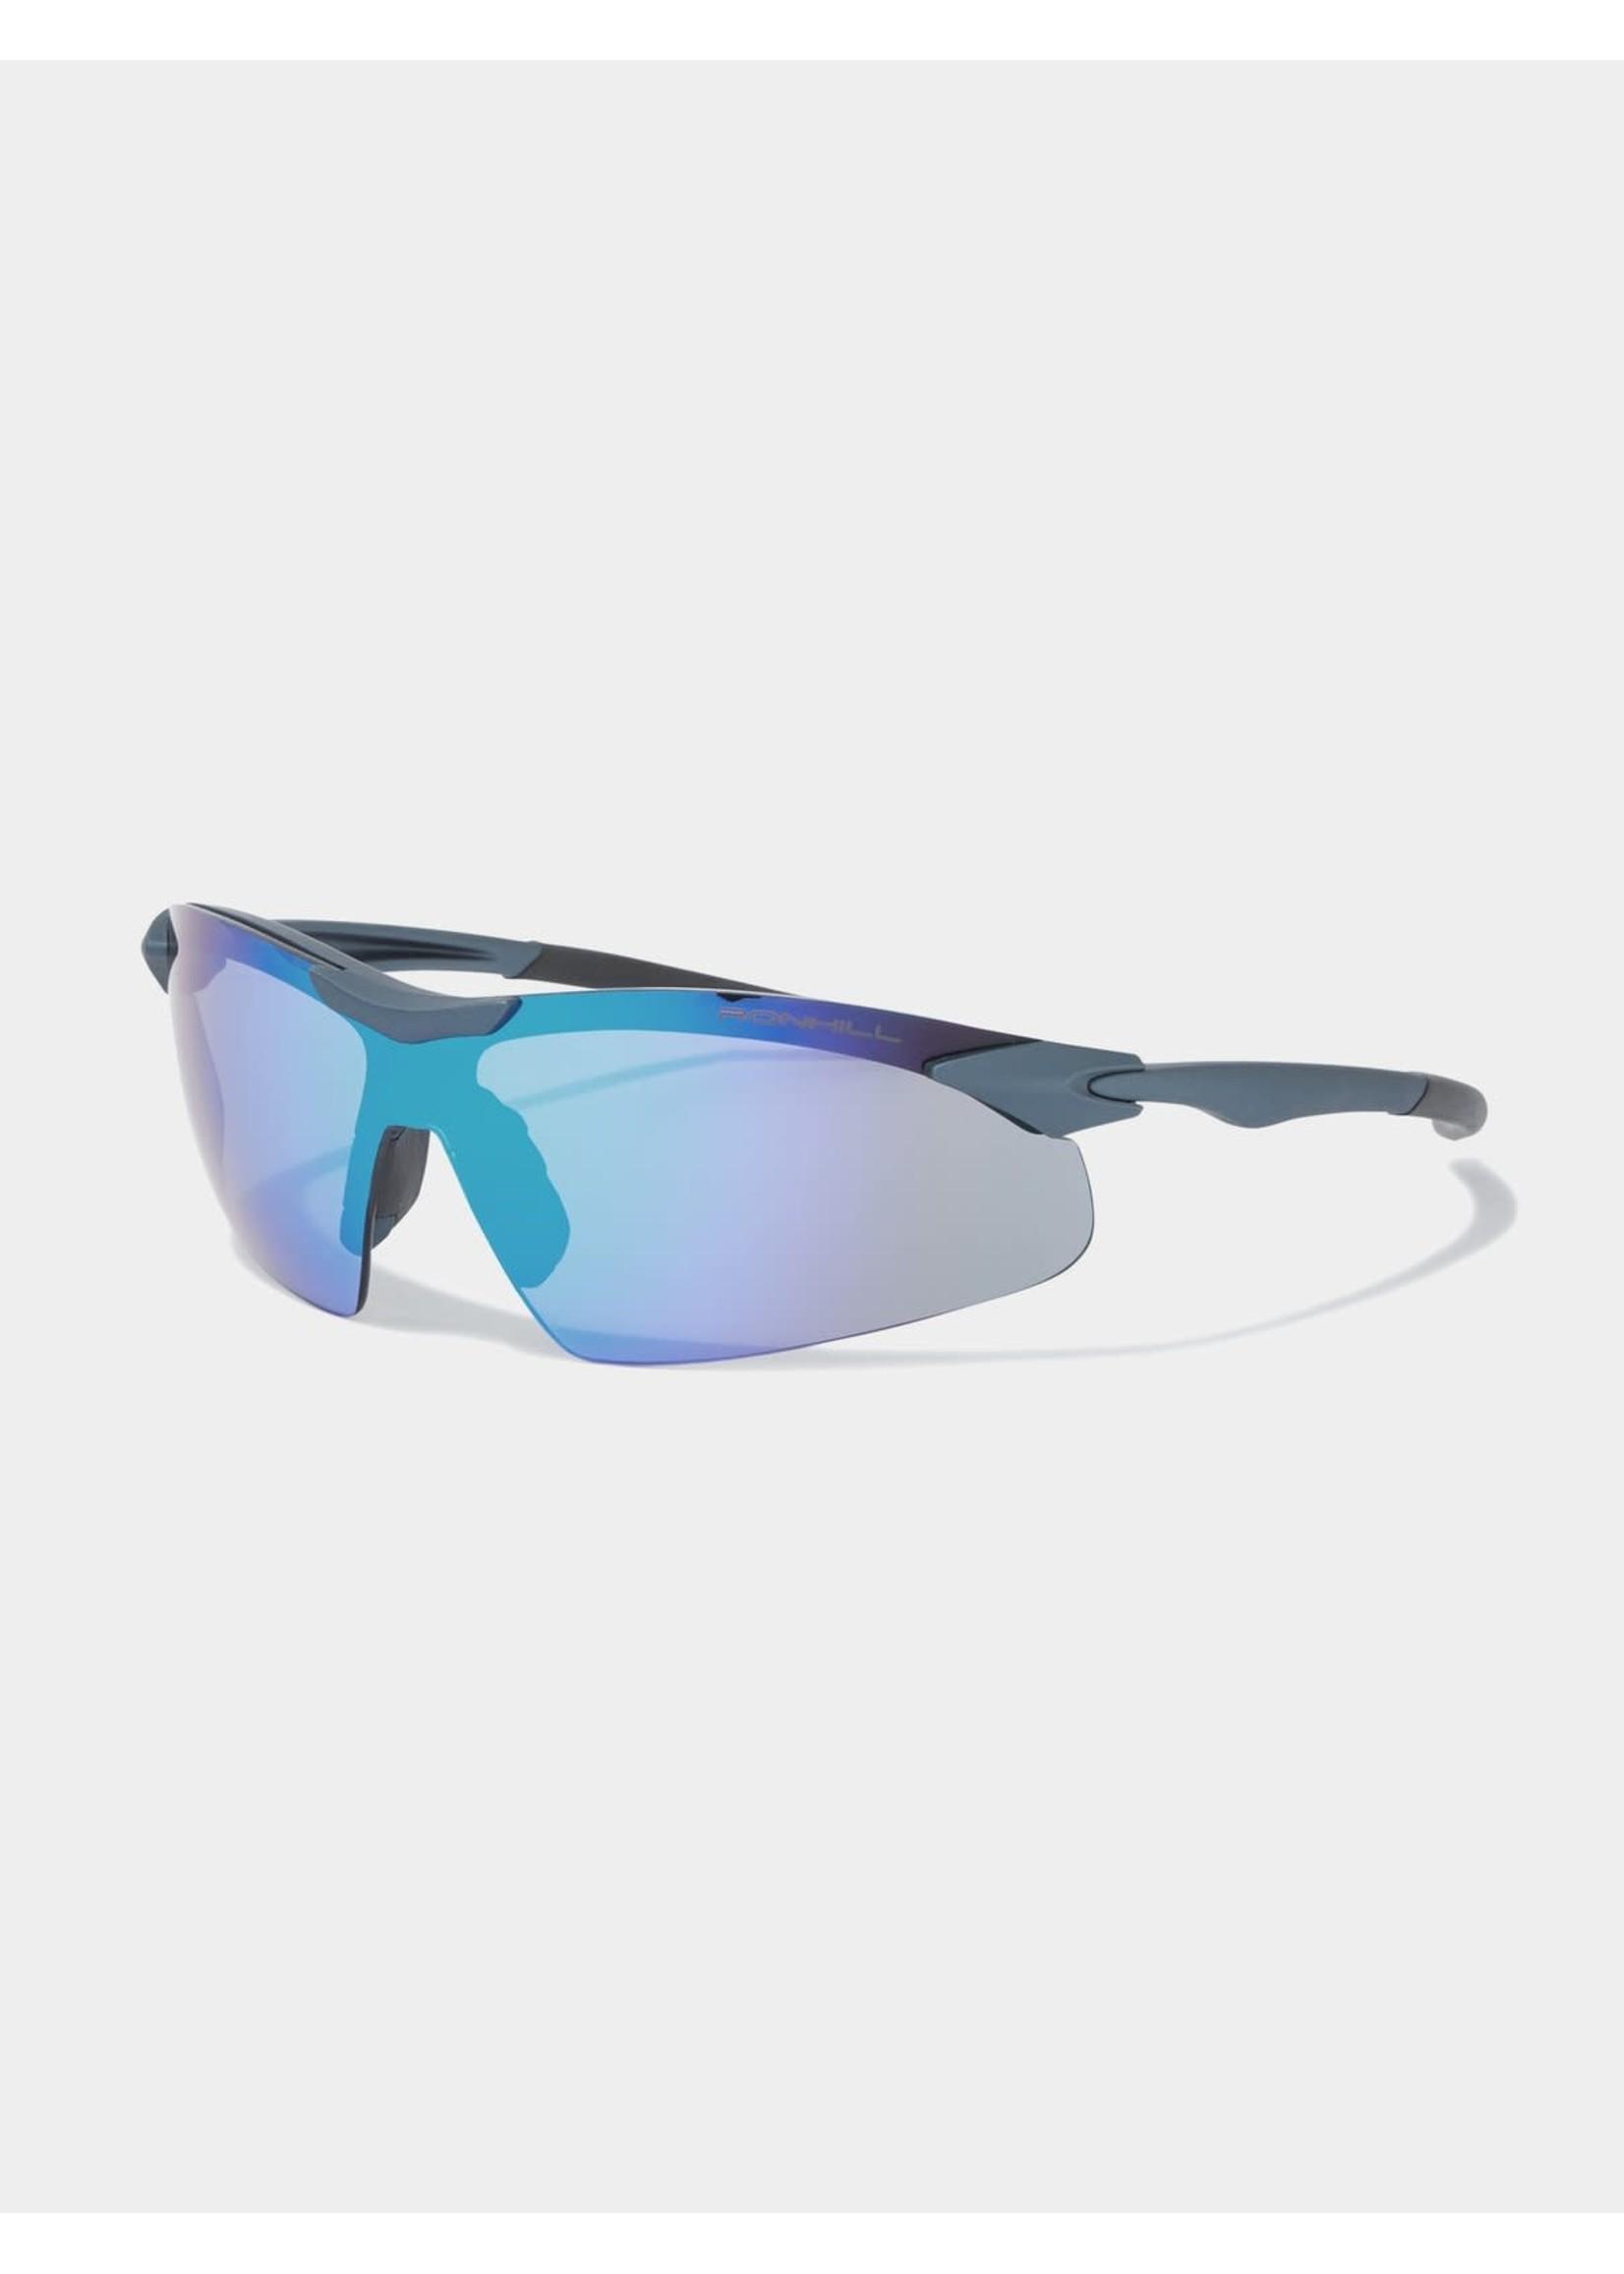 Ronhill RonHill Tokyo Sunglasses (2021) - Carbon/blue